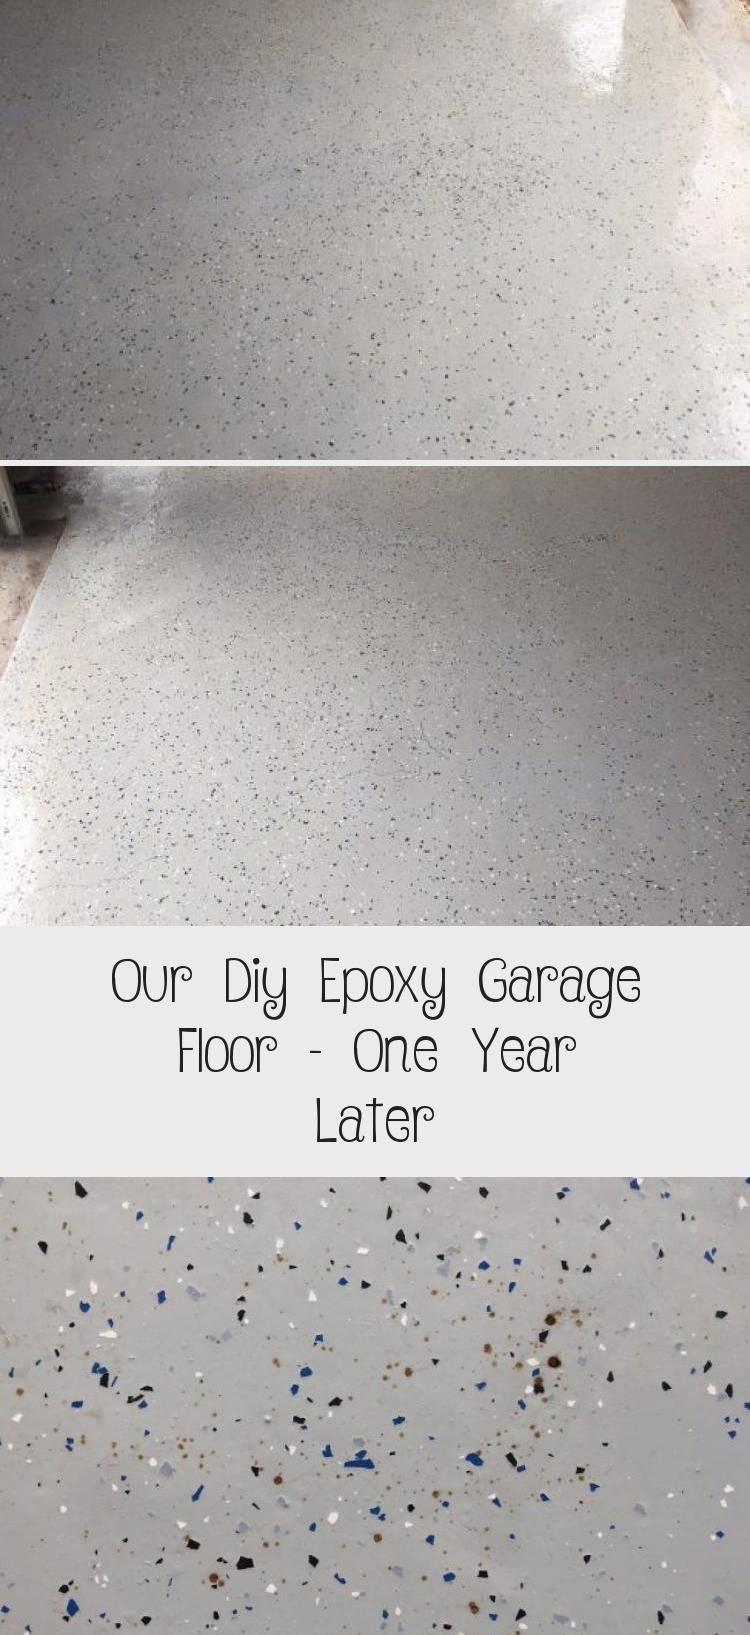 Our Diy Epoxy Garage Floor One Year Later Epoxy DIY in